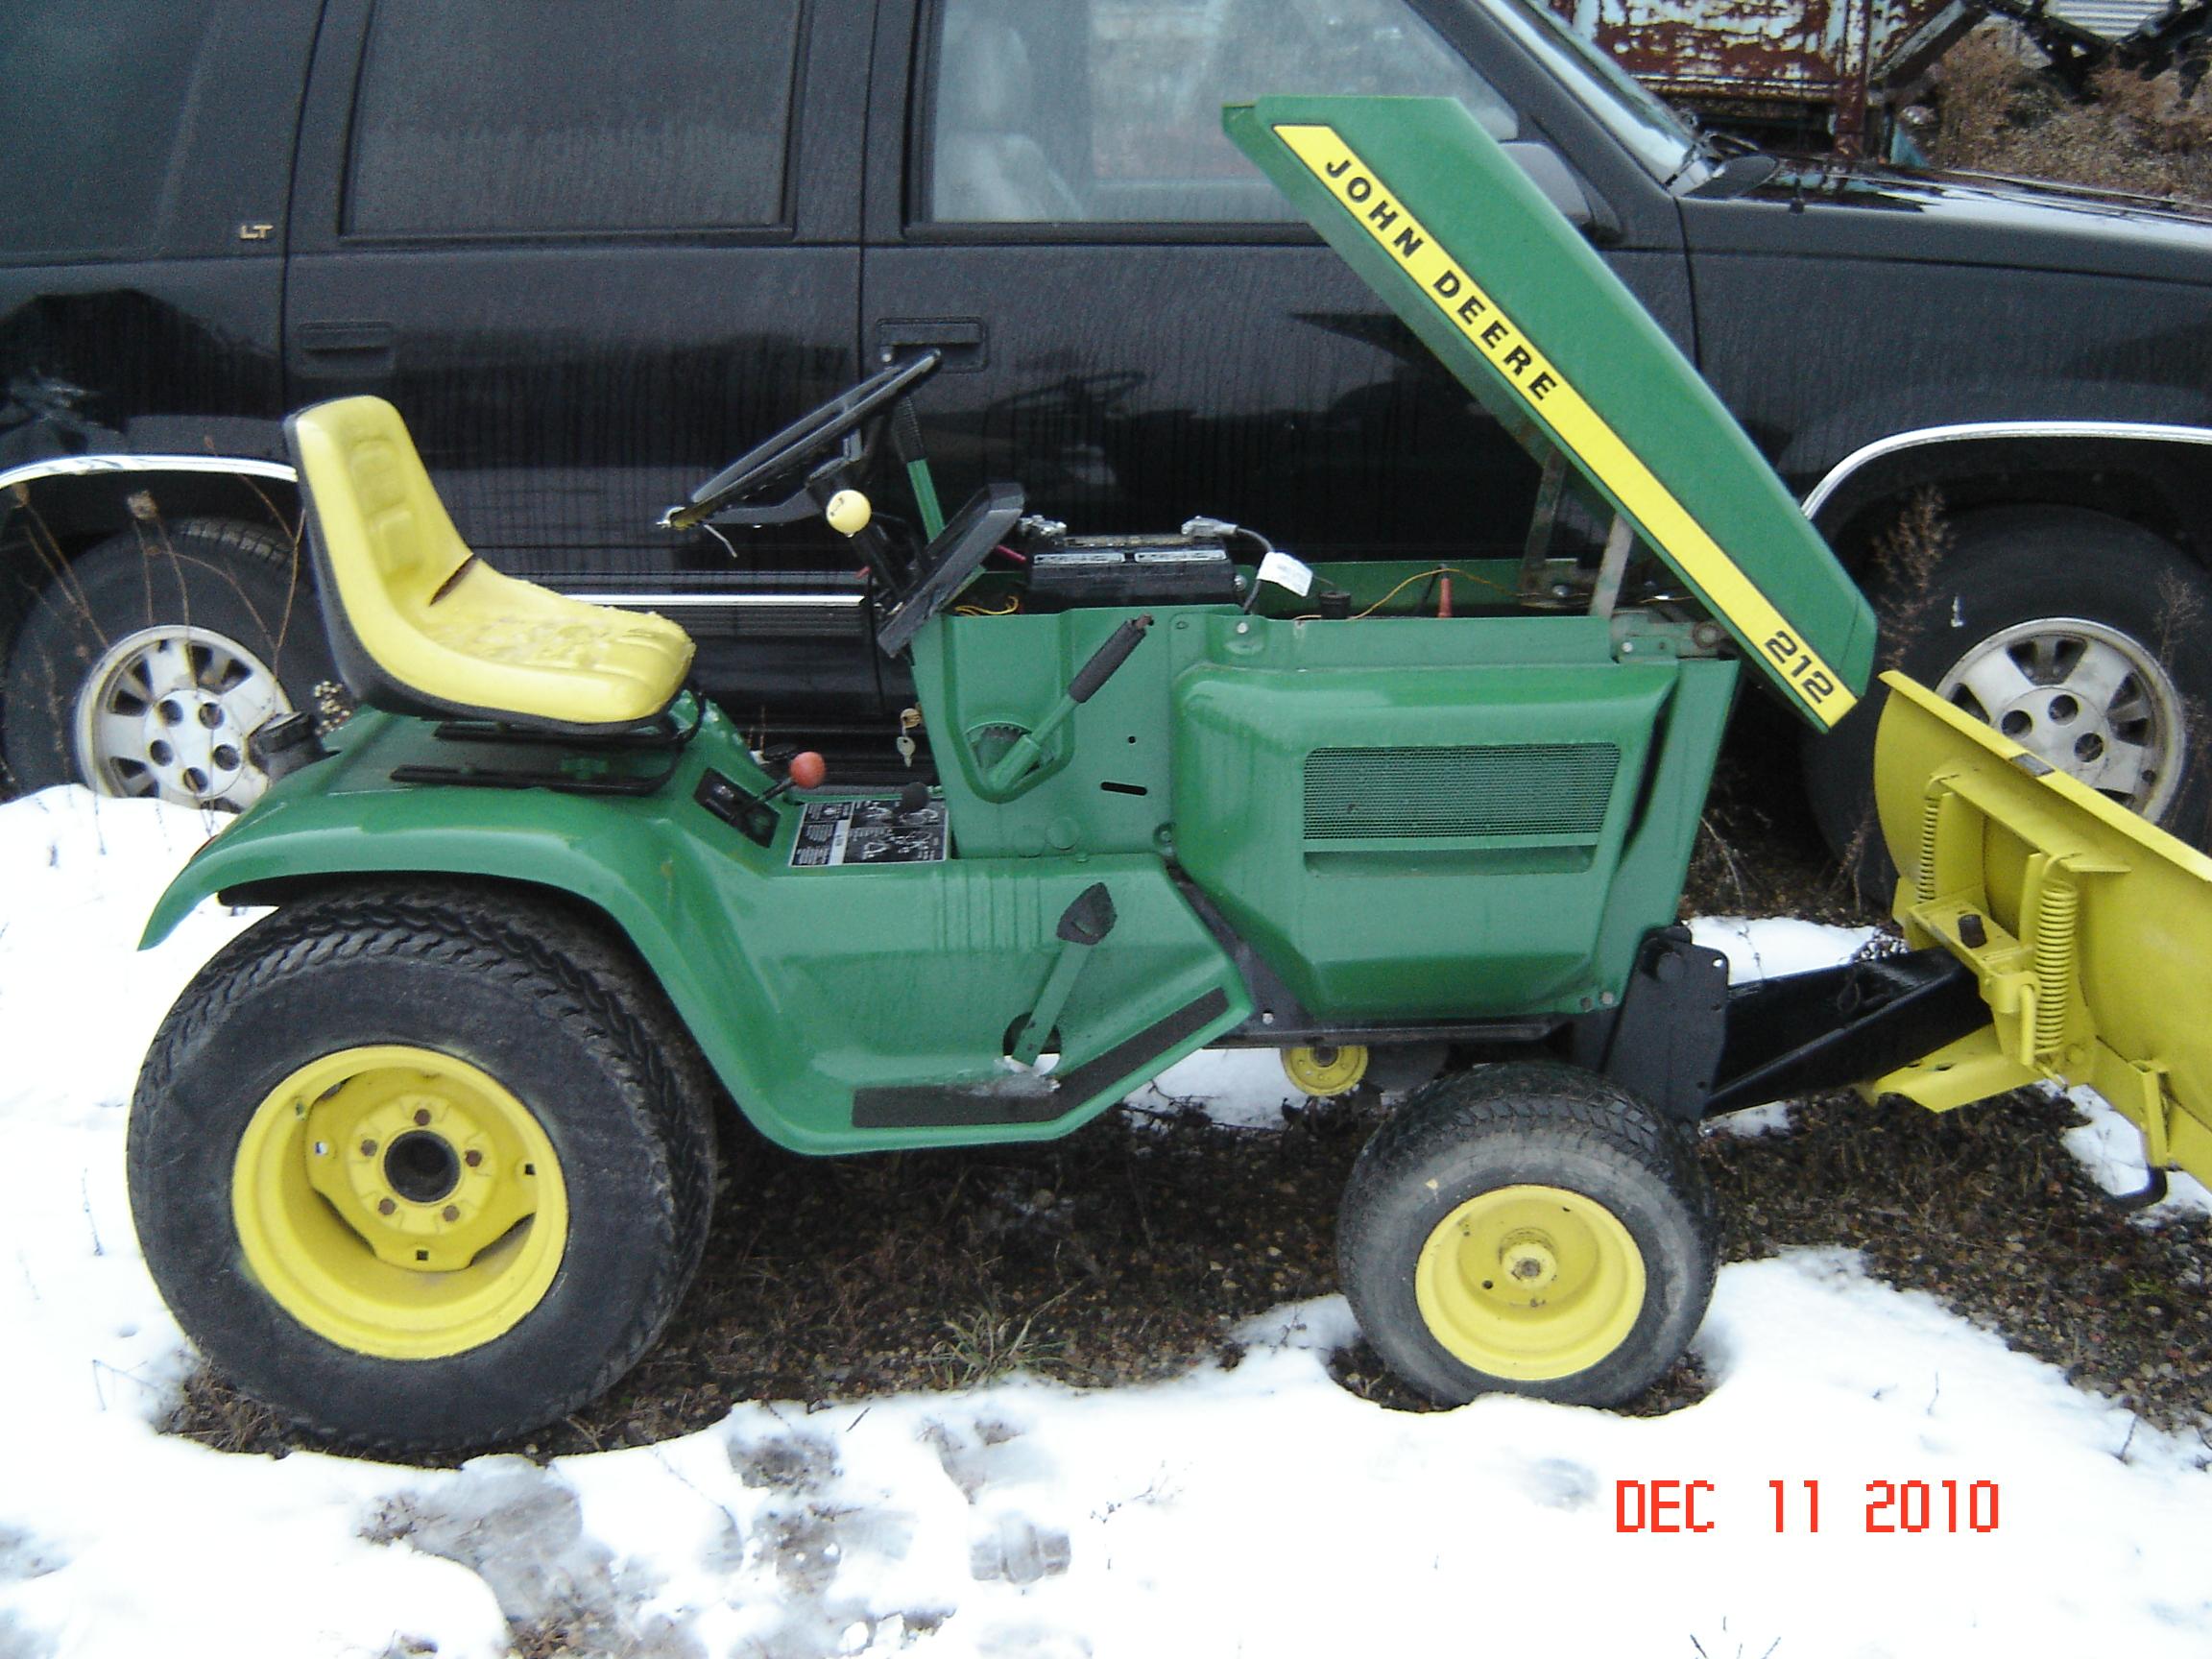 John Deere 212 Mower: John Deere 212 - e-cighq.com